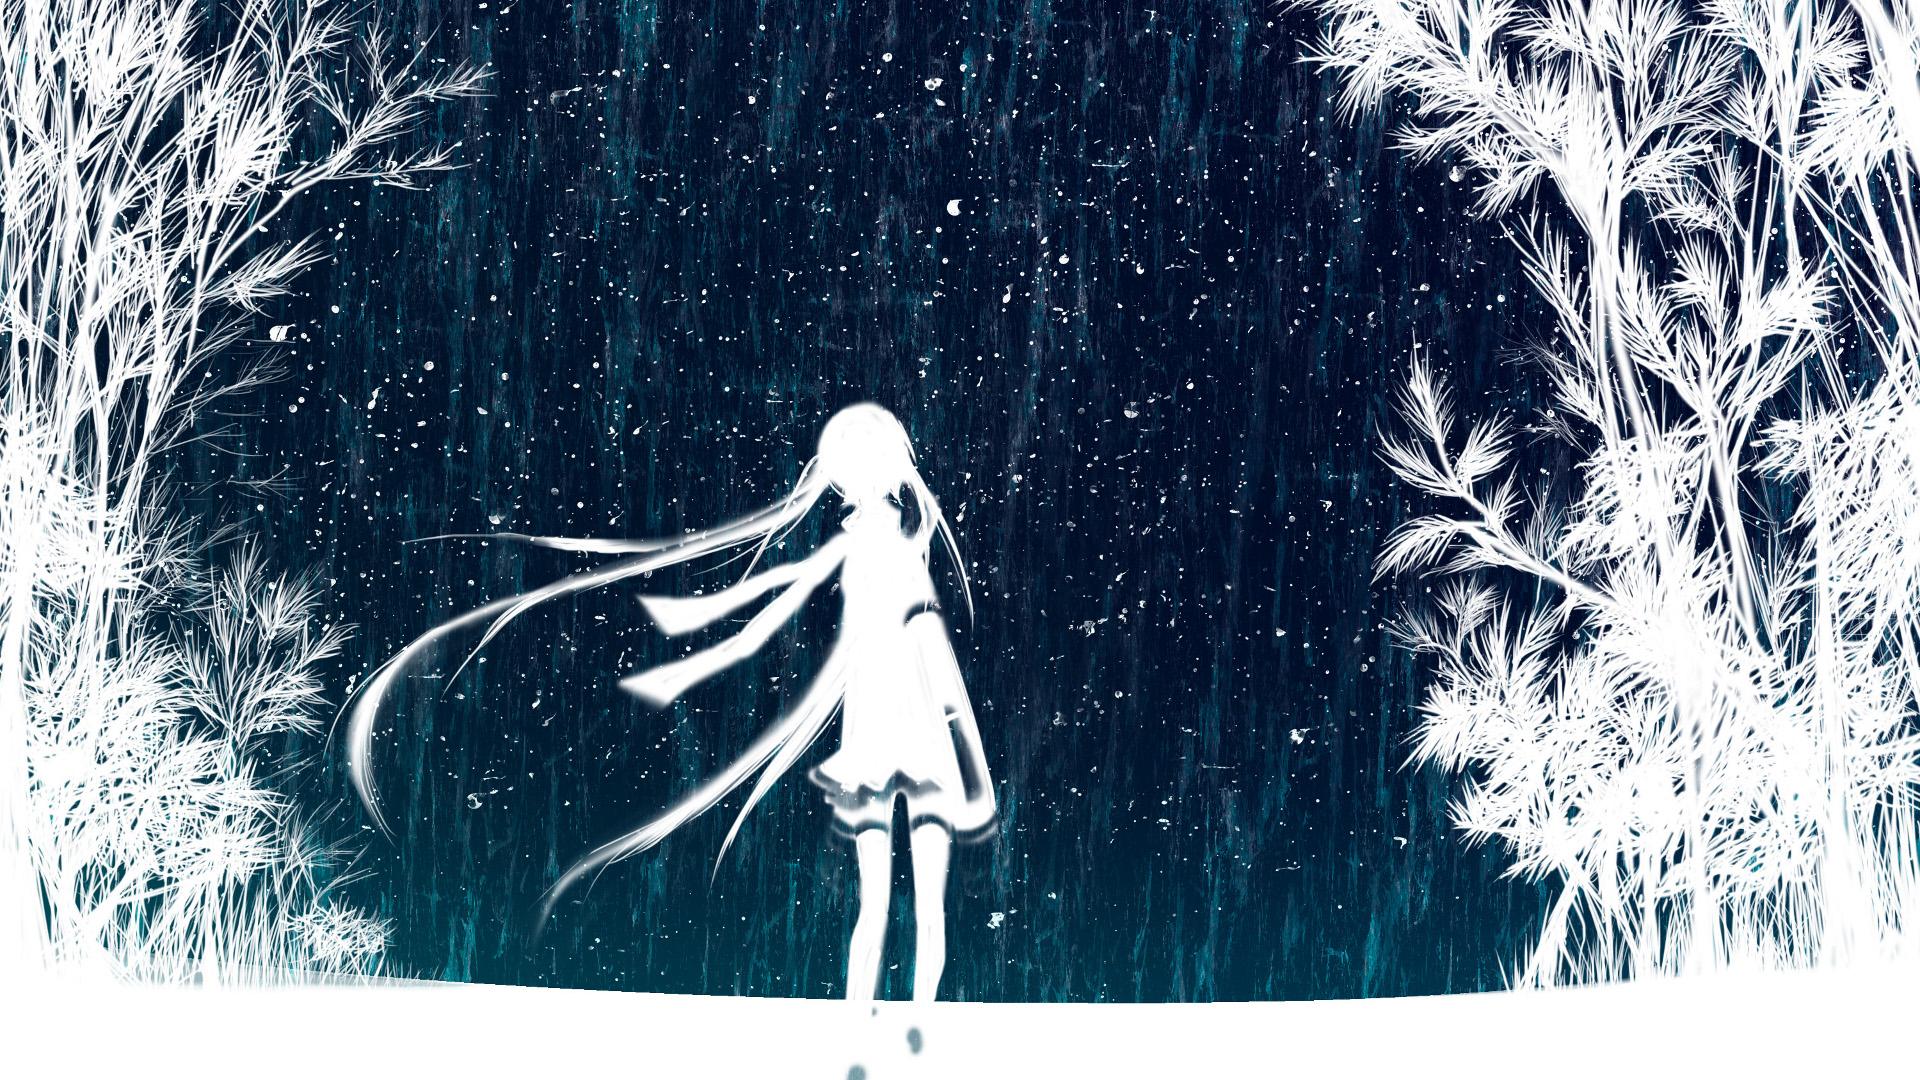 winter_season_snow_trees_dark_vocaloid_white_hatsune_desktop_1920x1080_hd-wallpaper-8116012